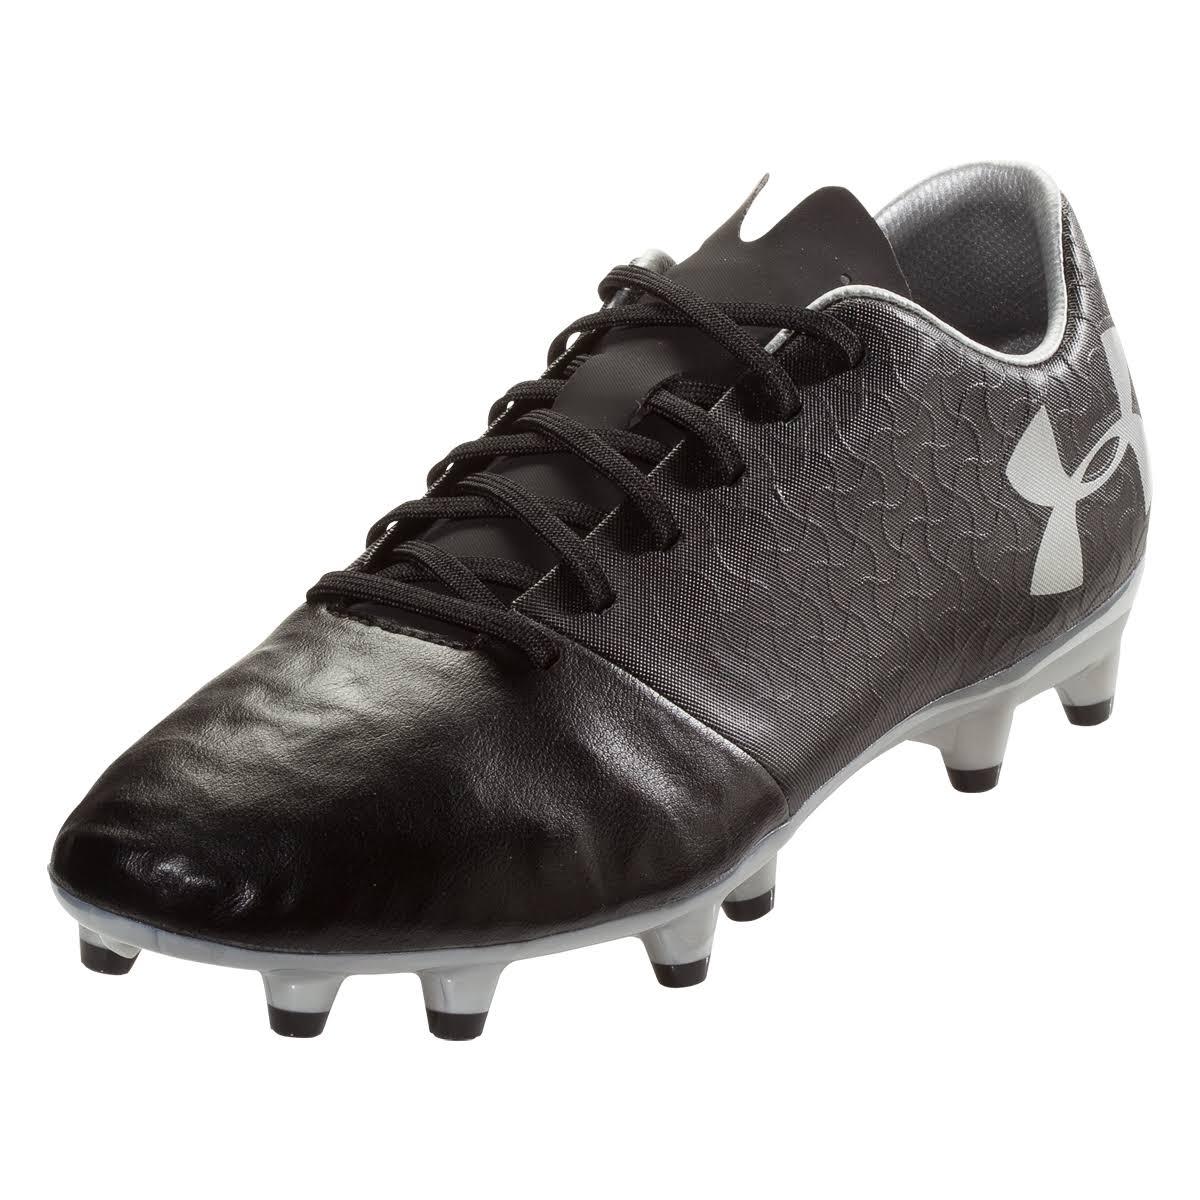 11 Select Soccer Armadura Bajo Ua Fg Magnetico La Cleat pq6wU